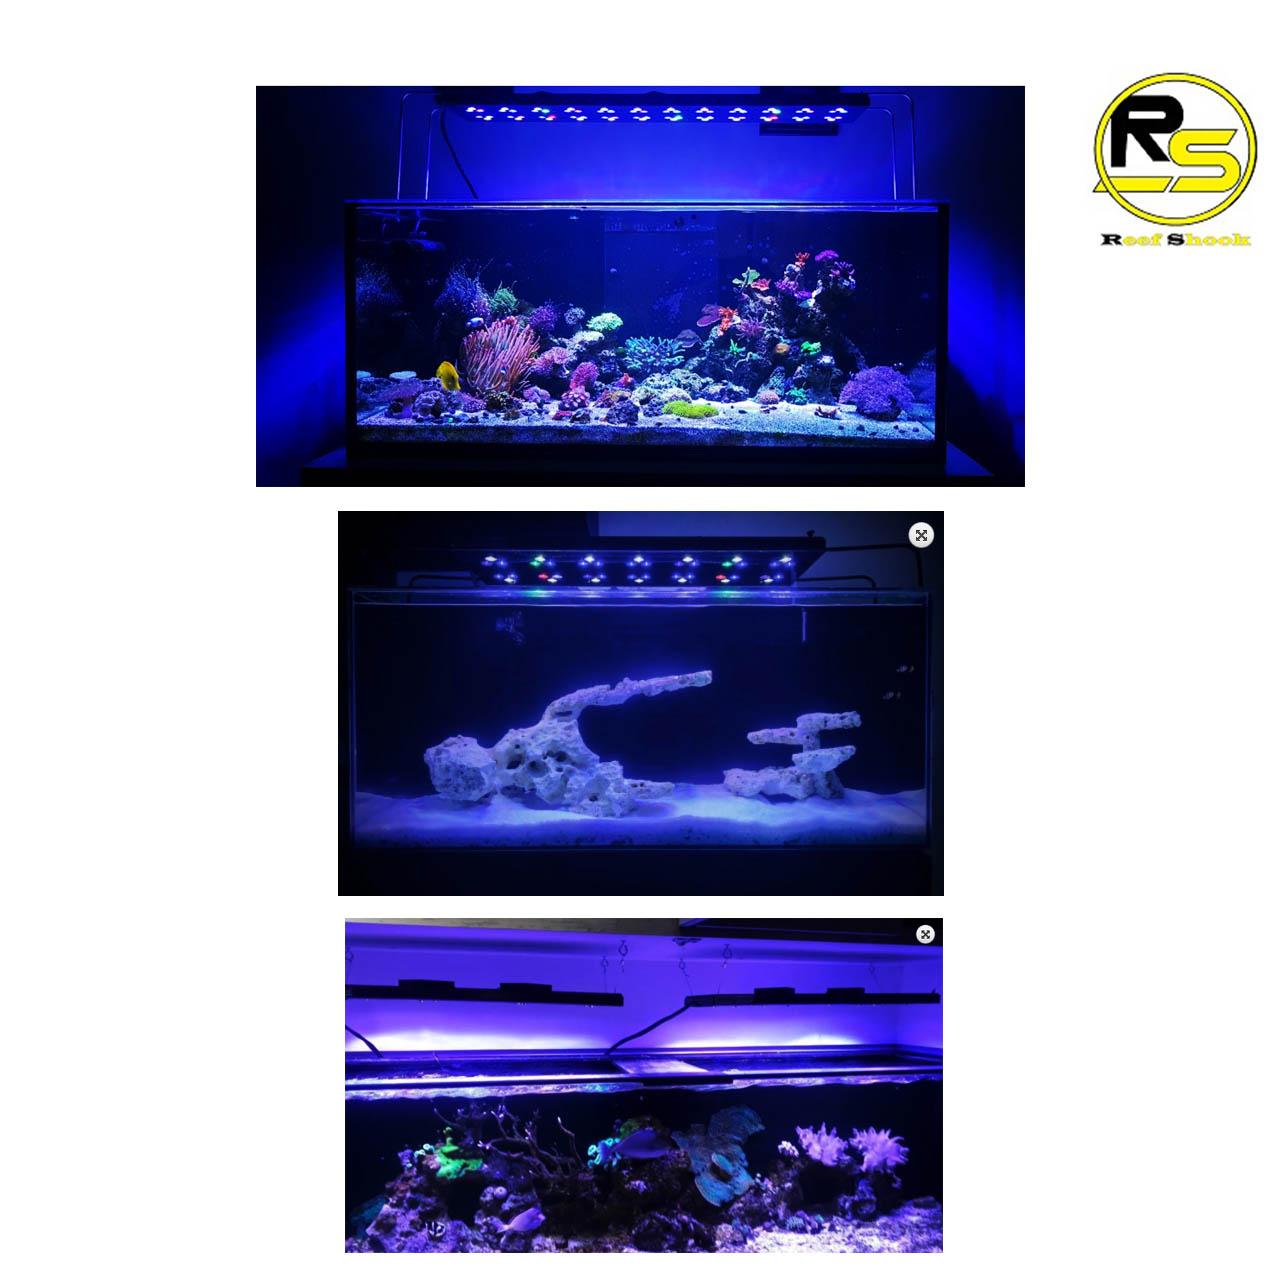 Luminaria Aquario Marinho 40cm Wifi 108w Led Cree Aqua Lumini Top Reef Coral